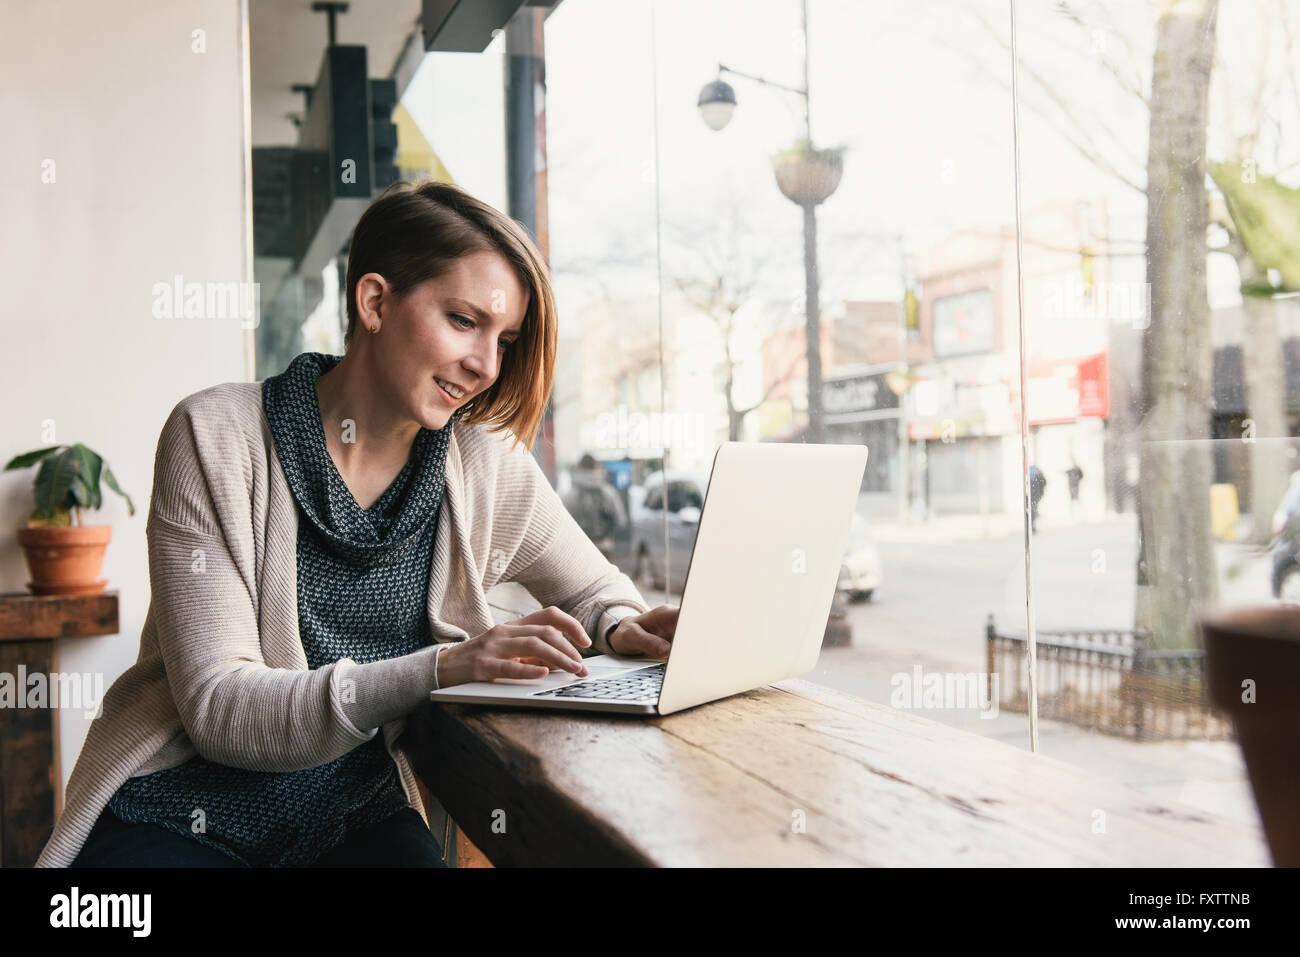 Female Customer Sitting In Coffee